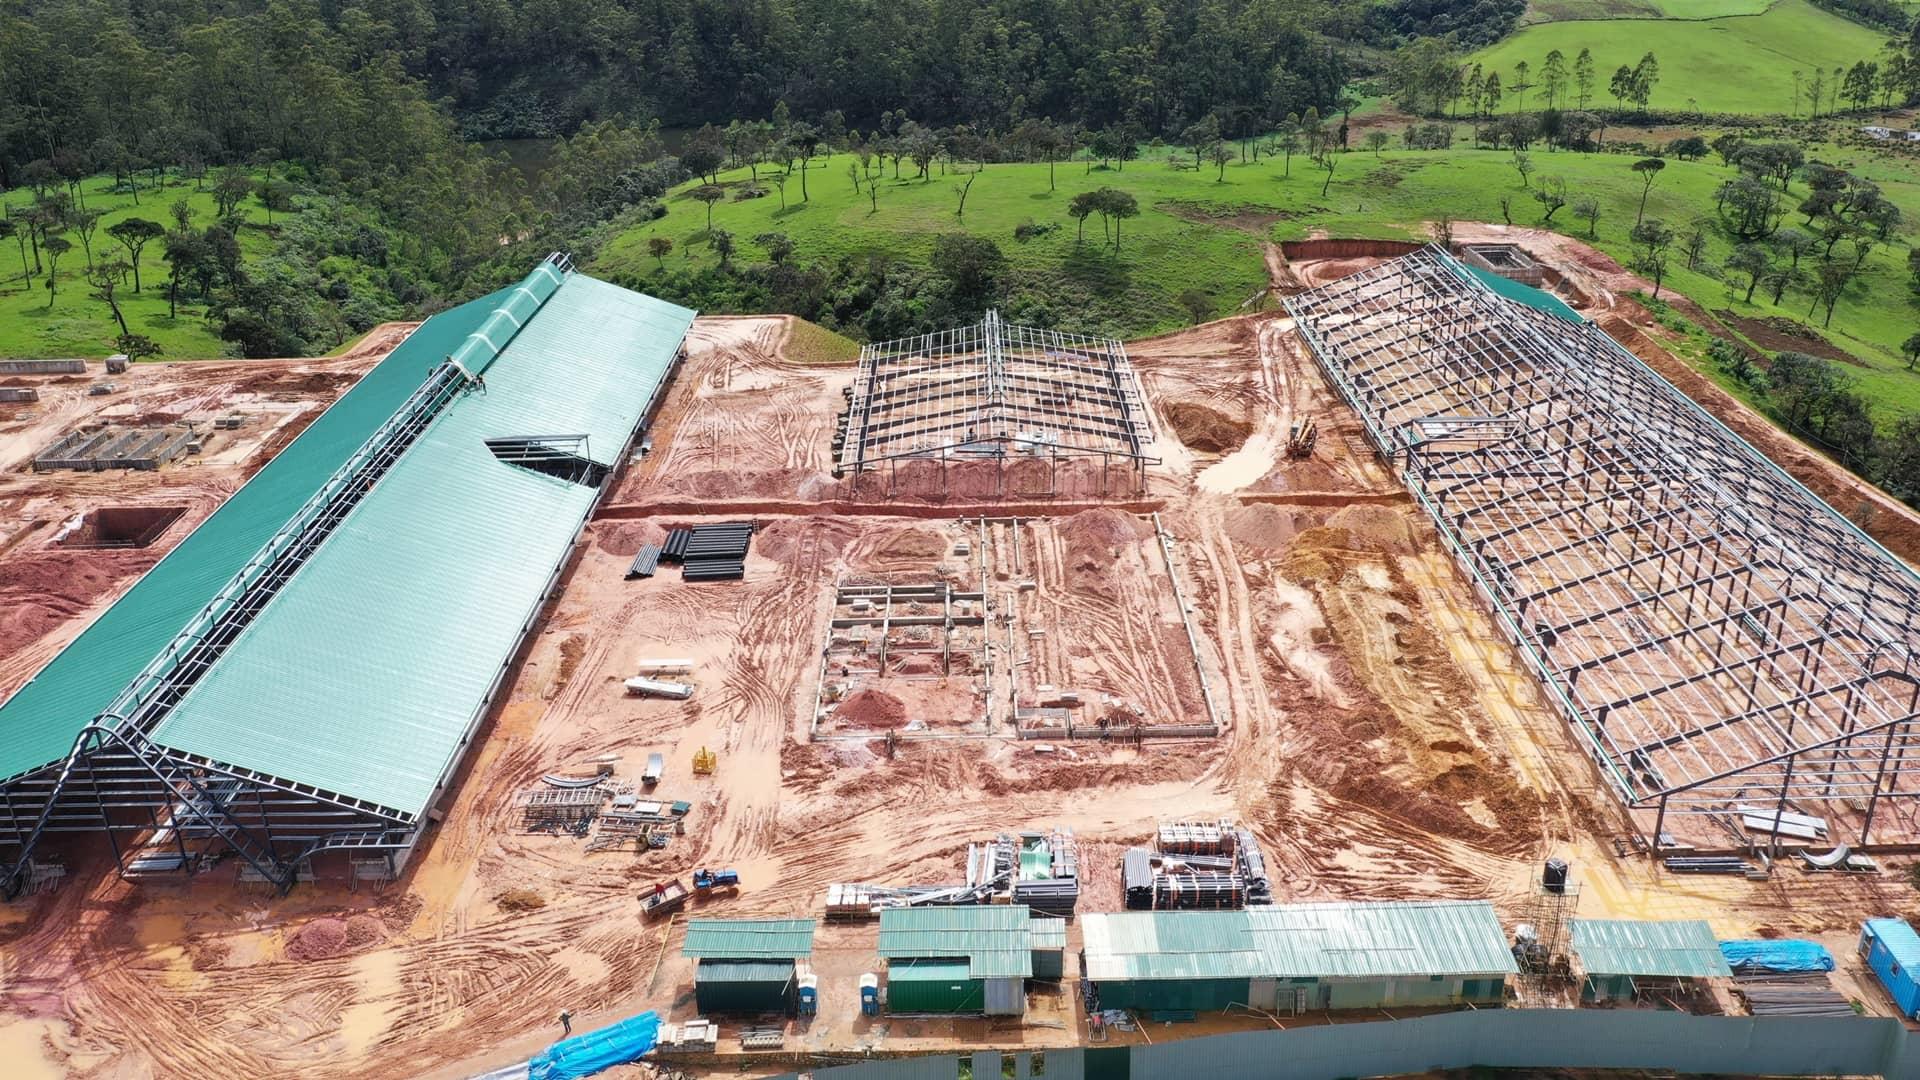 Dairy Farm Facility, Pattipola